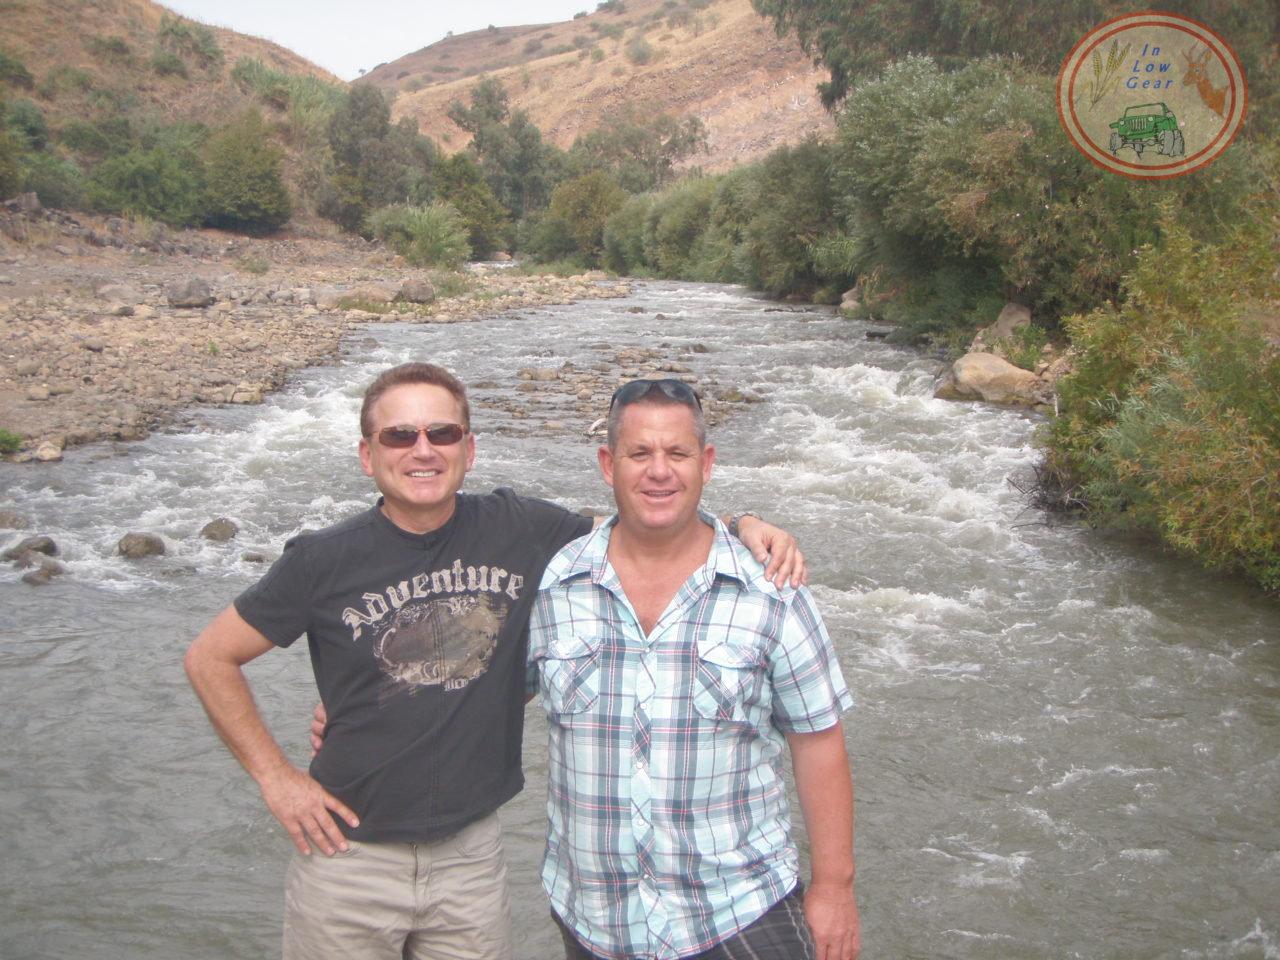 Jeep tours Golan: Gesher Hanasy טיוליג'יפים בגולן: גשר הנשיא